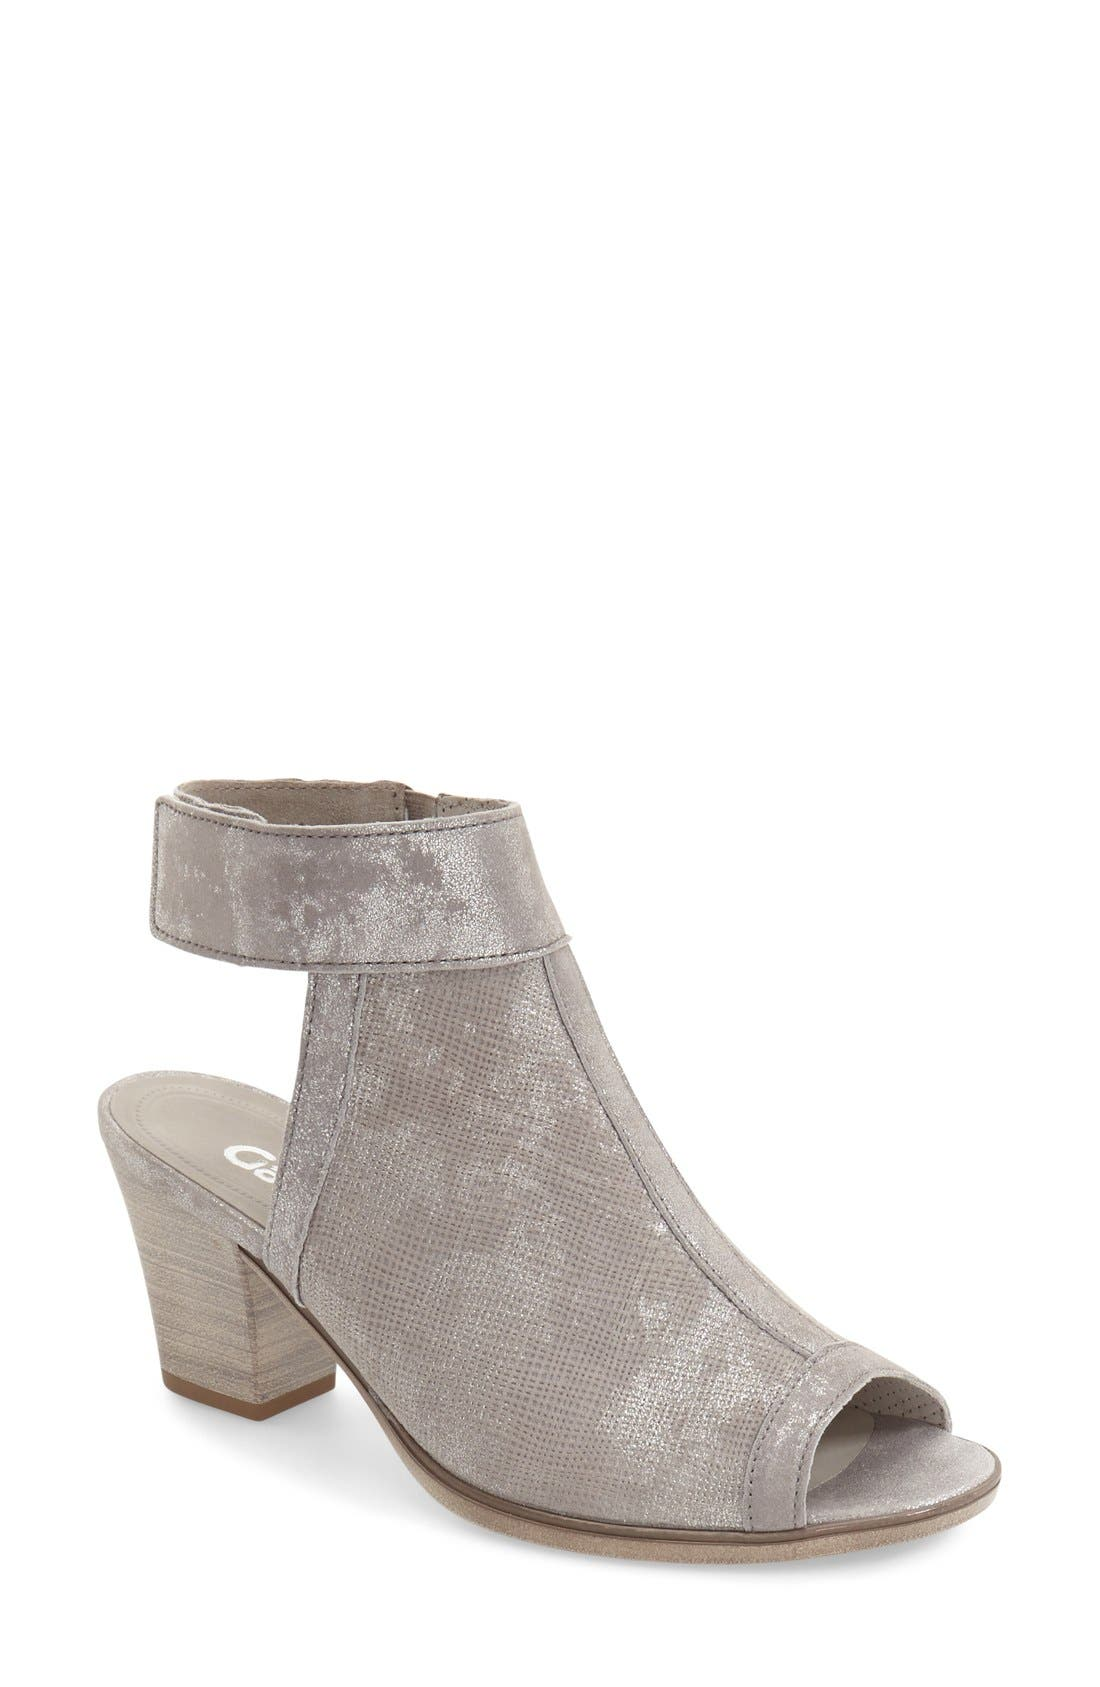 Open Toe Leather Sandal,                         Main,                         color, 040